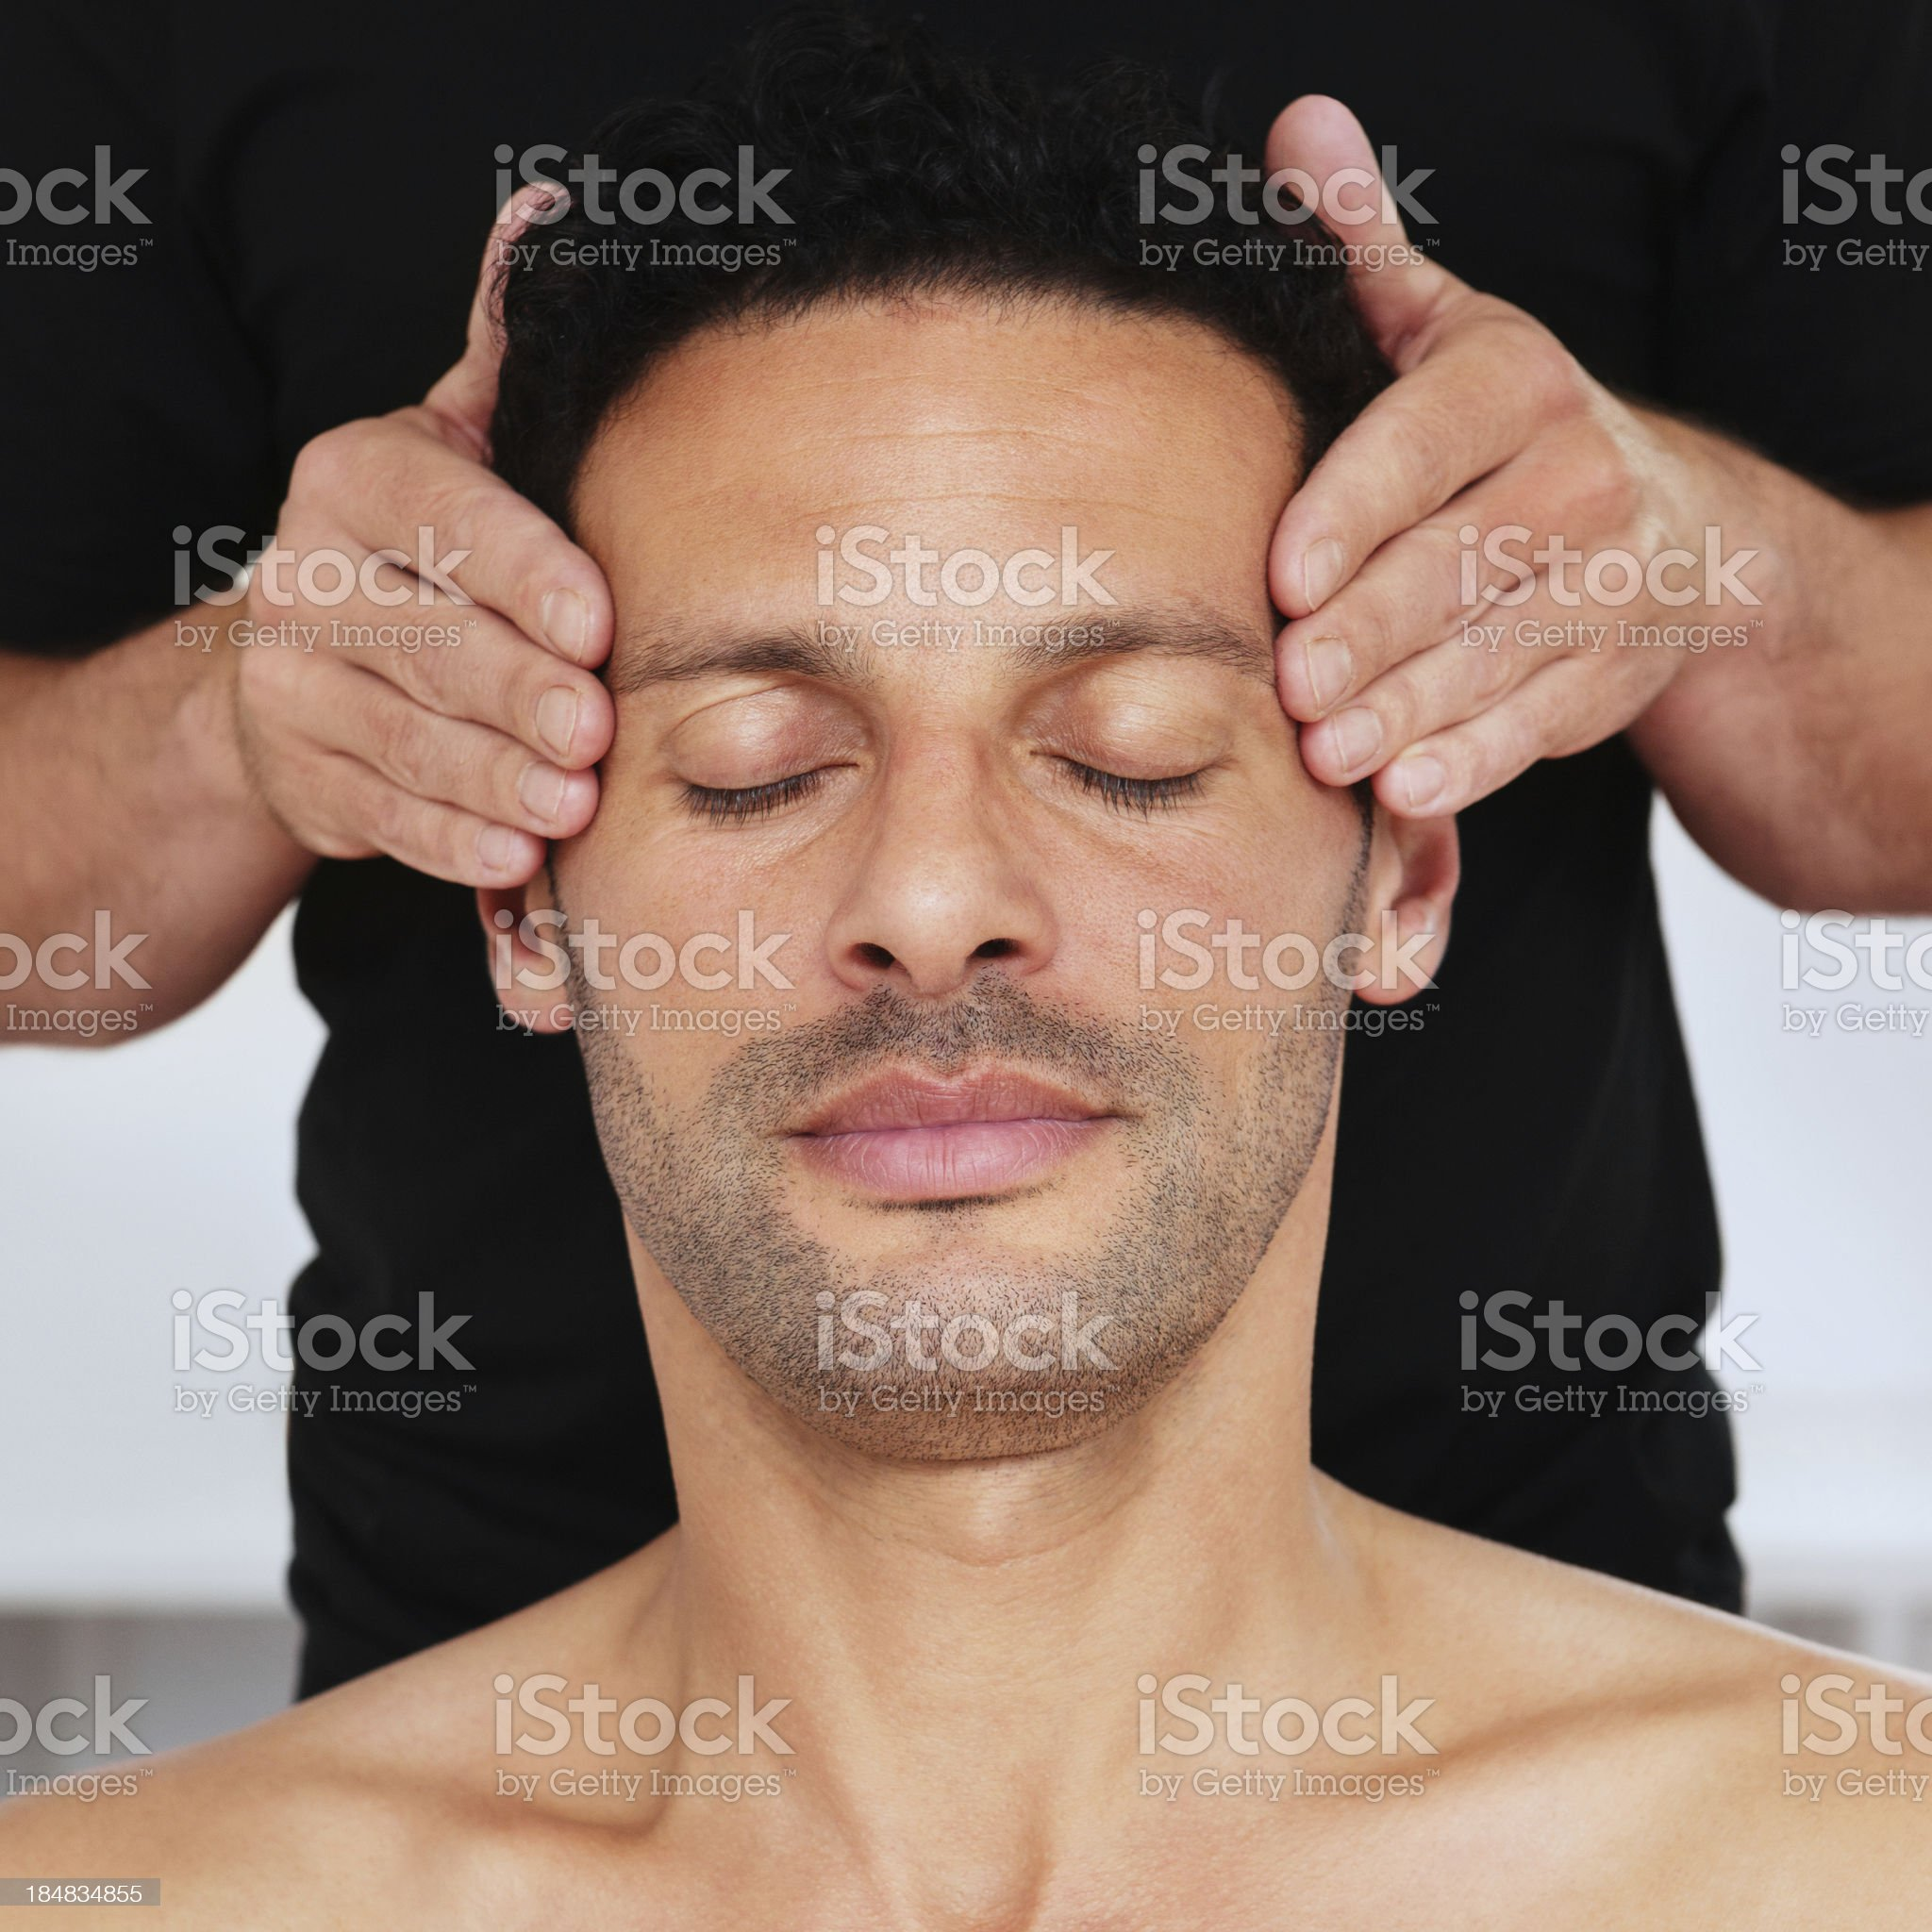 Man Getting a Head Massage royalty-free stock photo